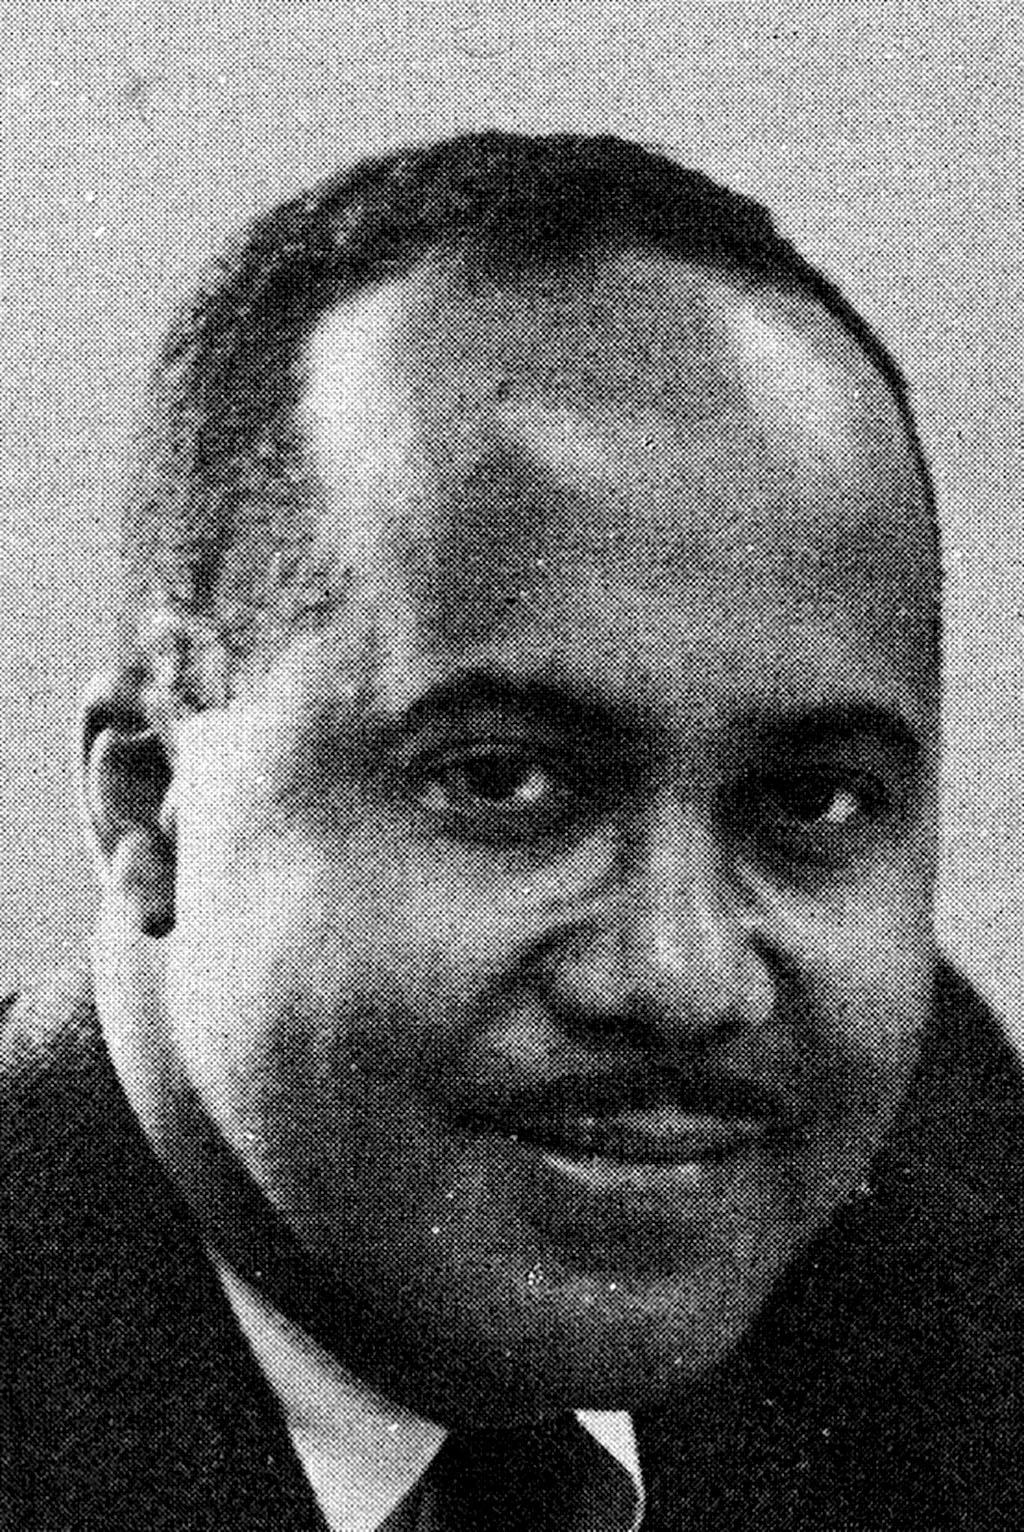 Charles Nelson, Ambassador to Swaziland-Lesotho, 1970